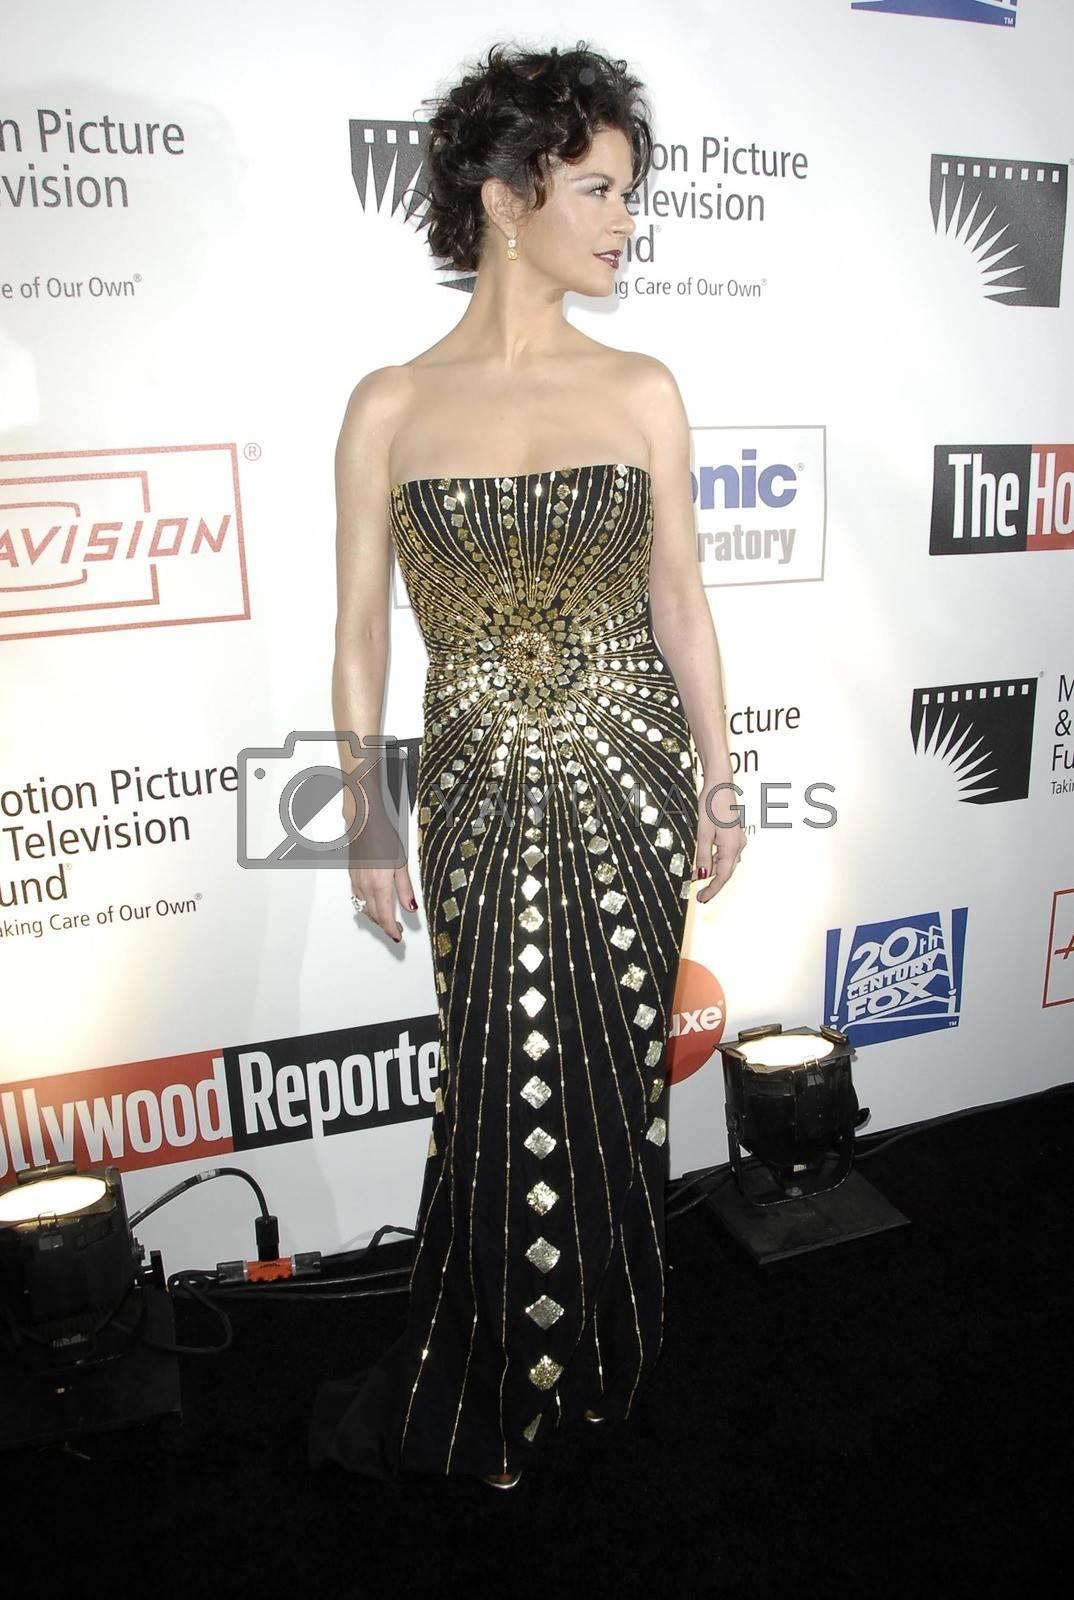 Catherine Zeta-Jones /ImageCollect by ImageCollect